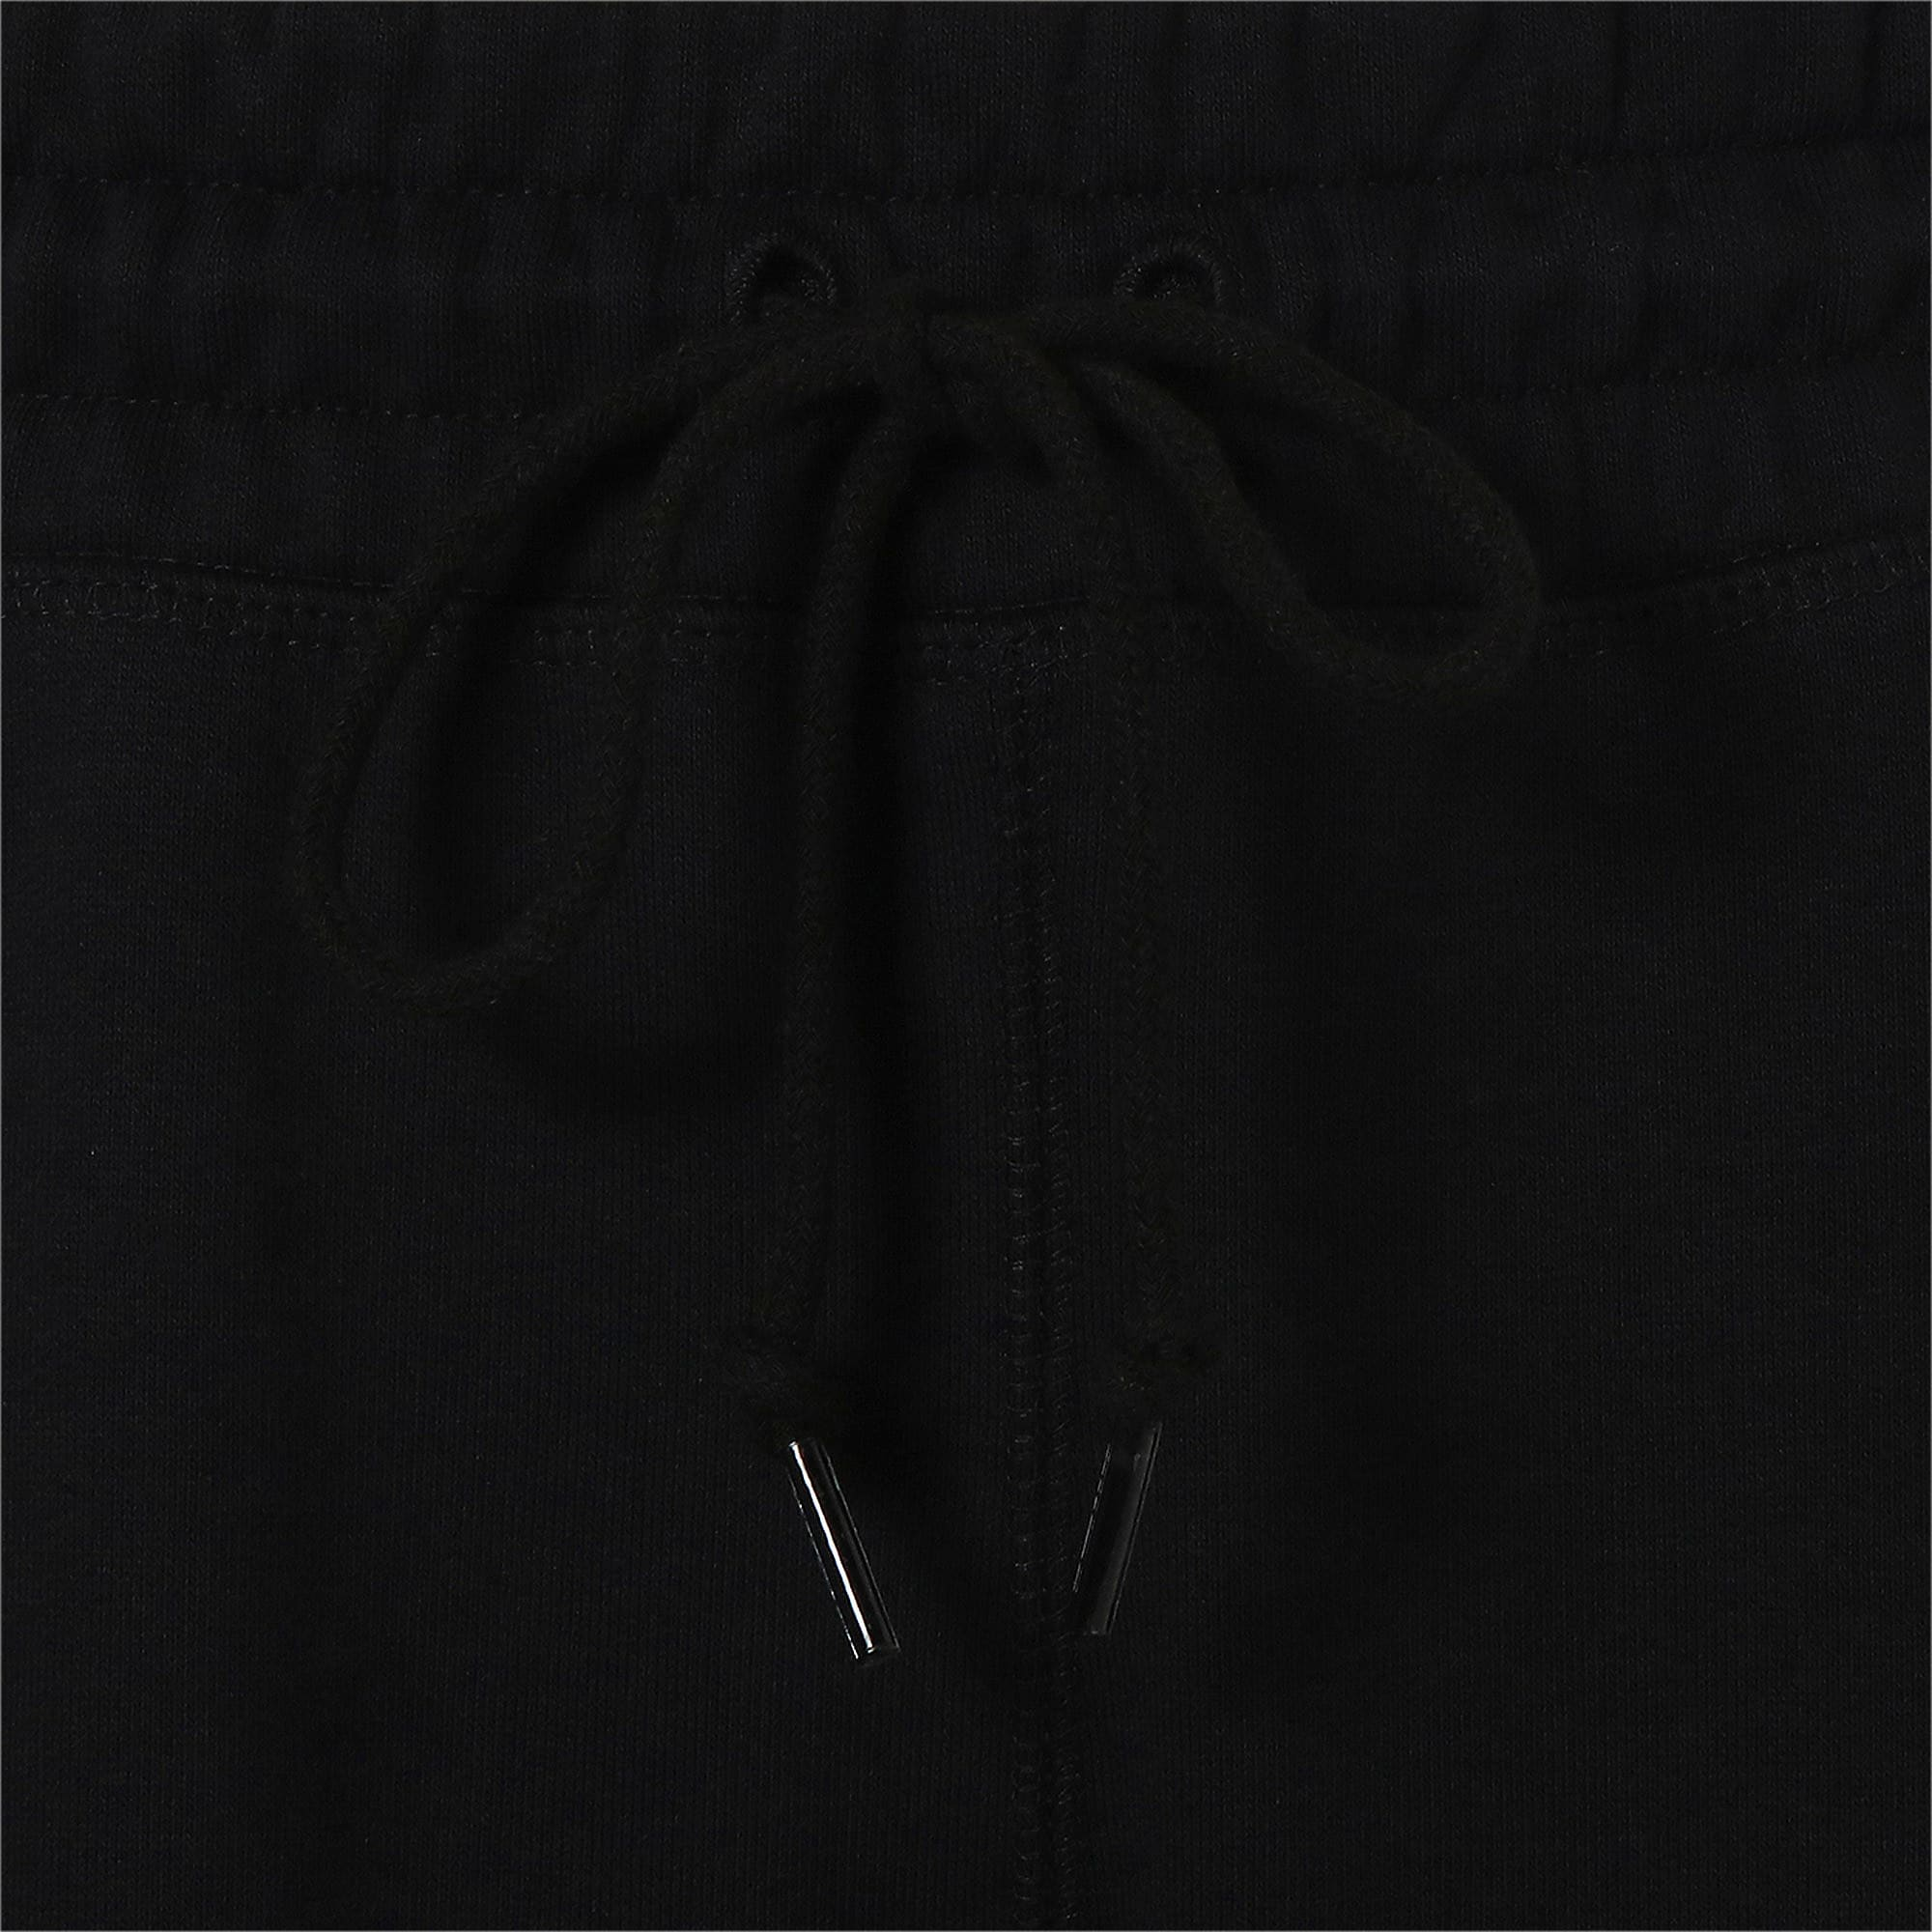 Thumbnail 10 of ダウンタウン スウェットパンツ, Puma Black, medium-JPN